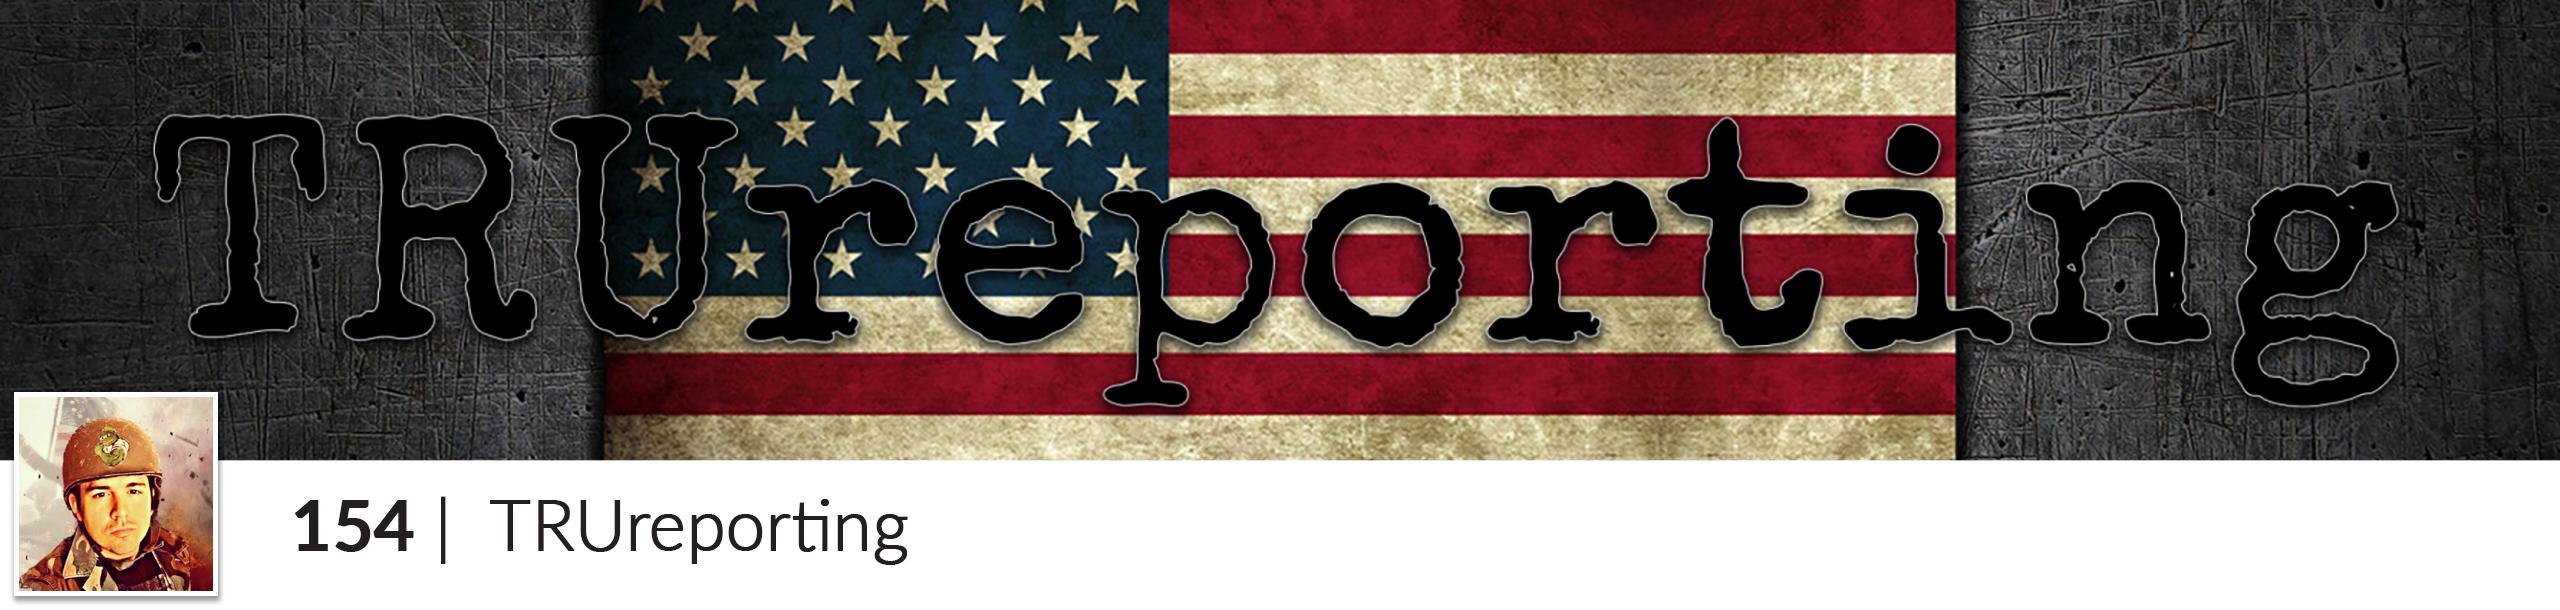 TRUreporting_header1